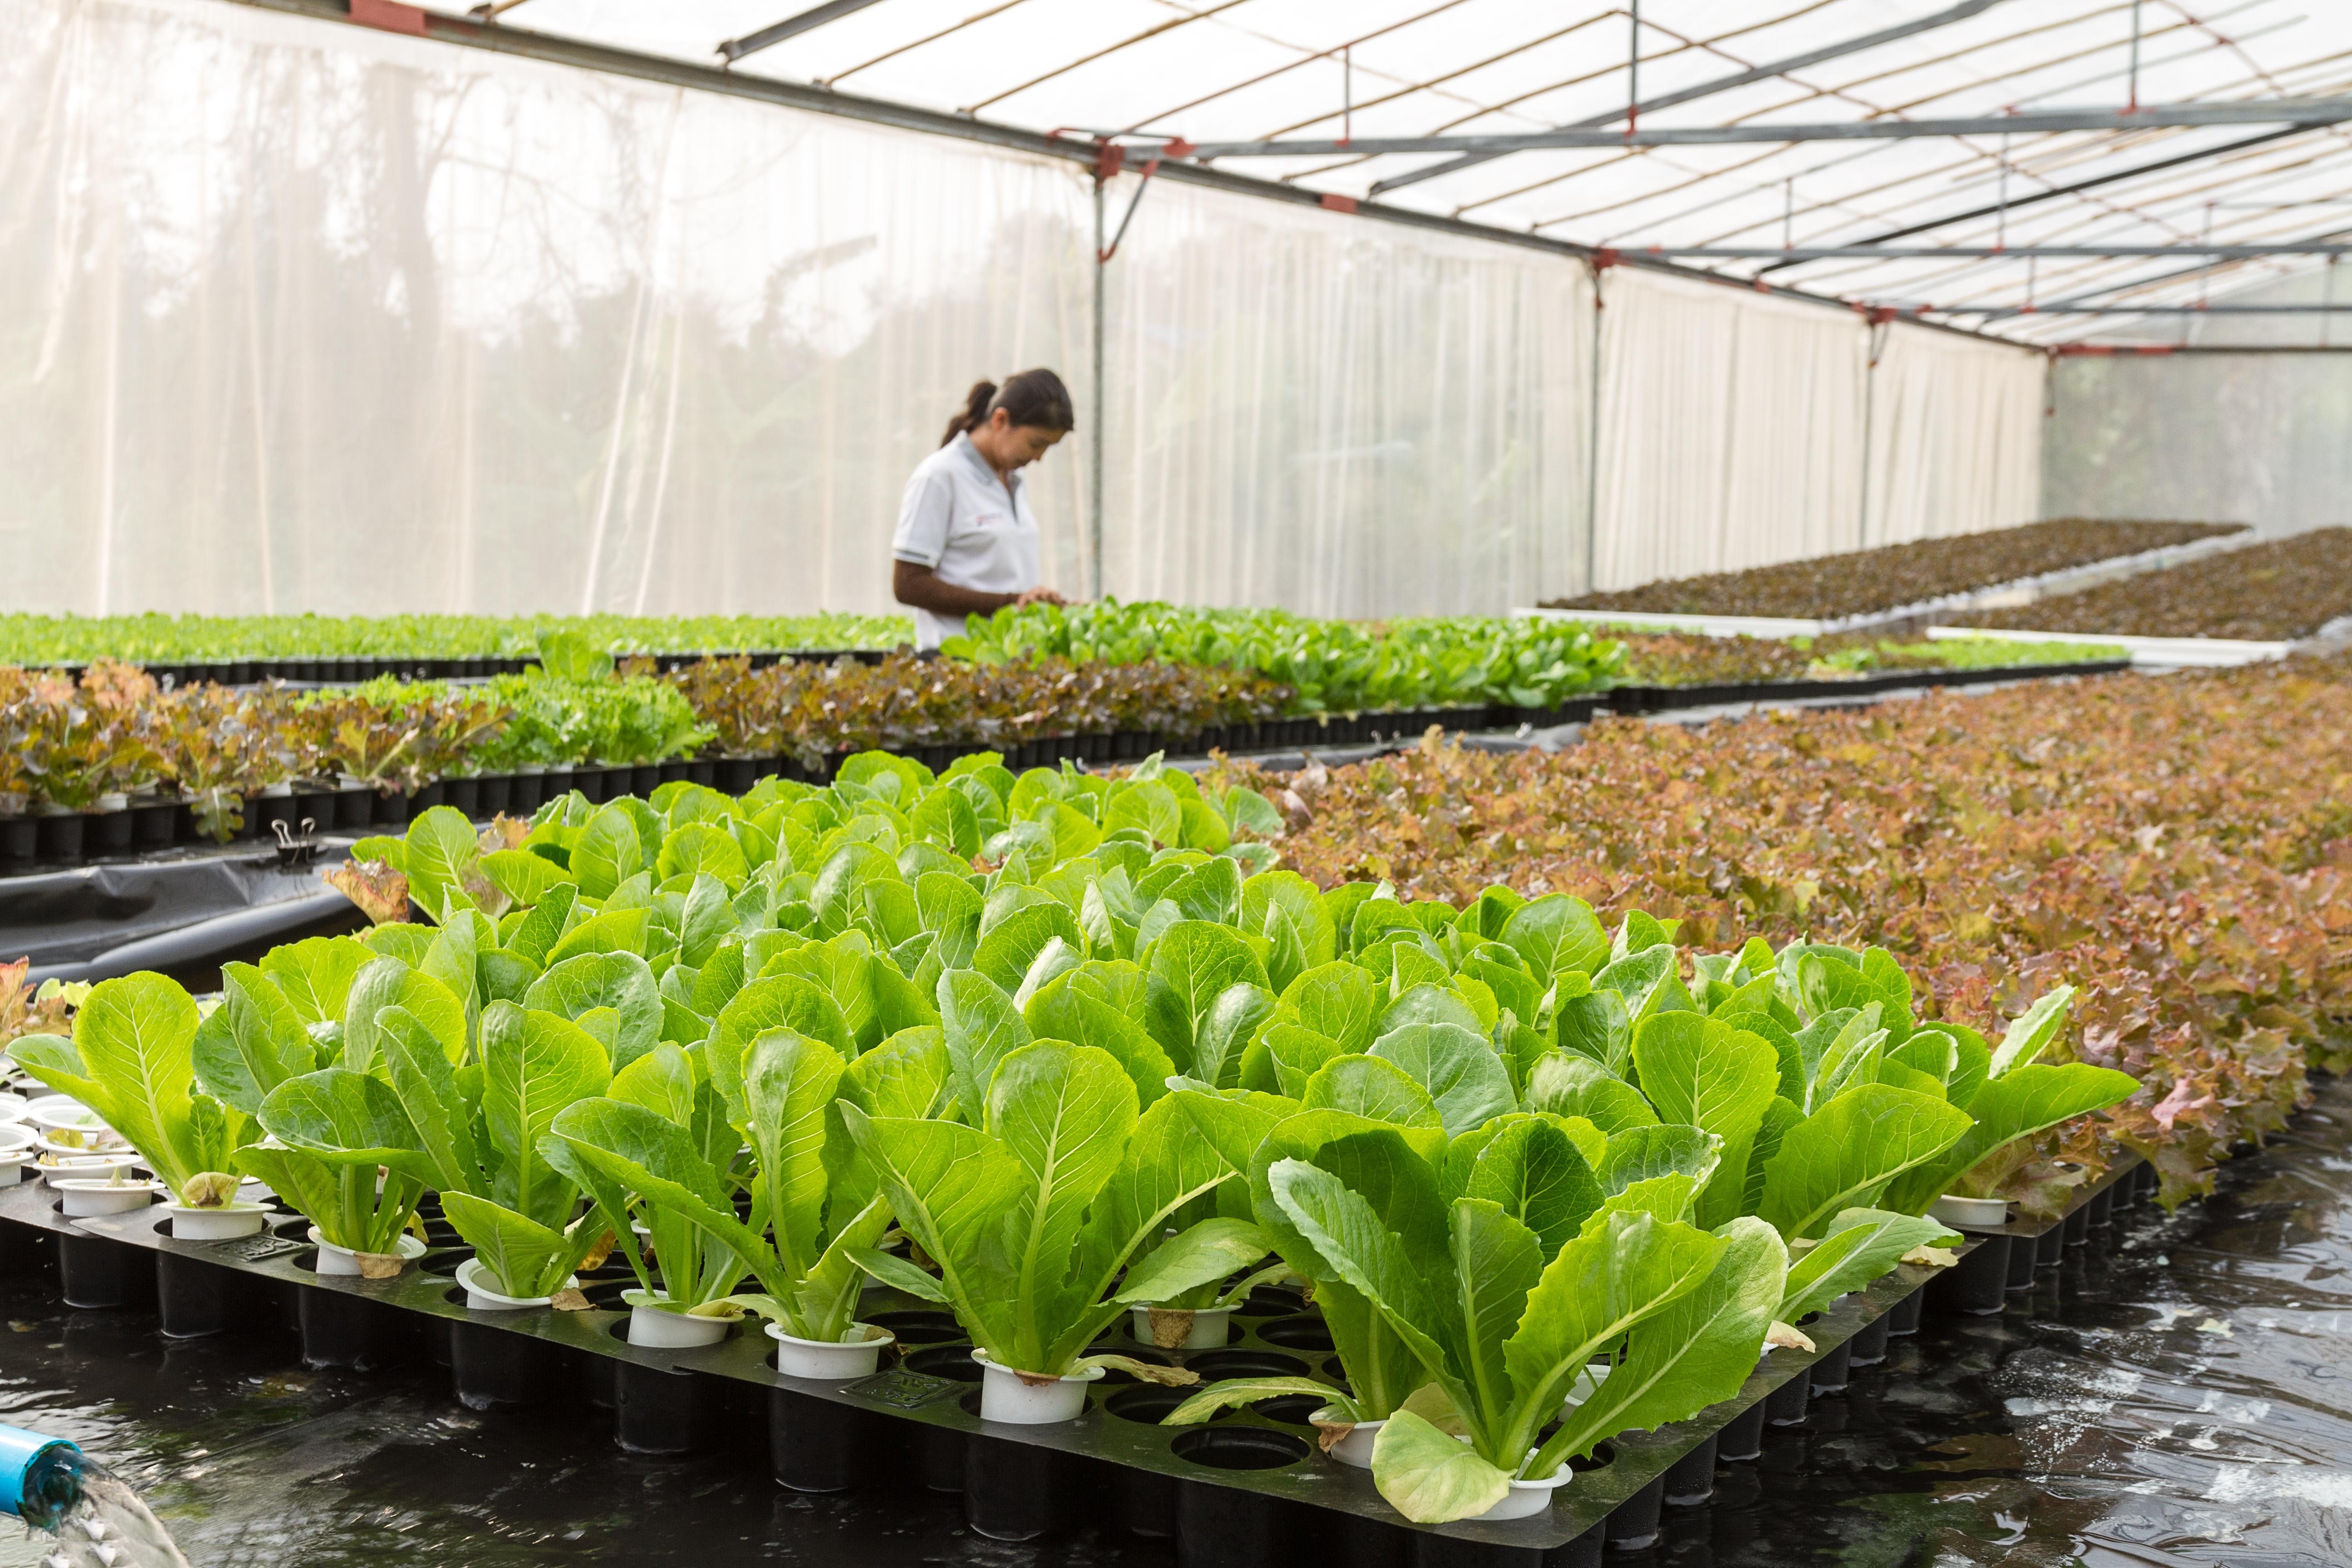 Бизнес на выращивании салата руб прибыли с 1 гектара